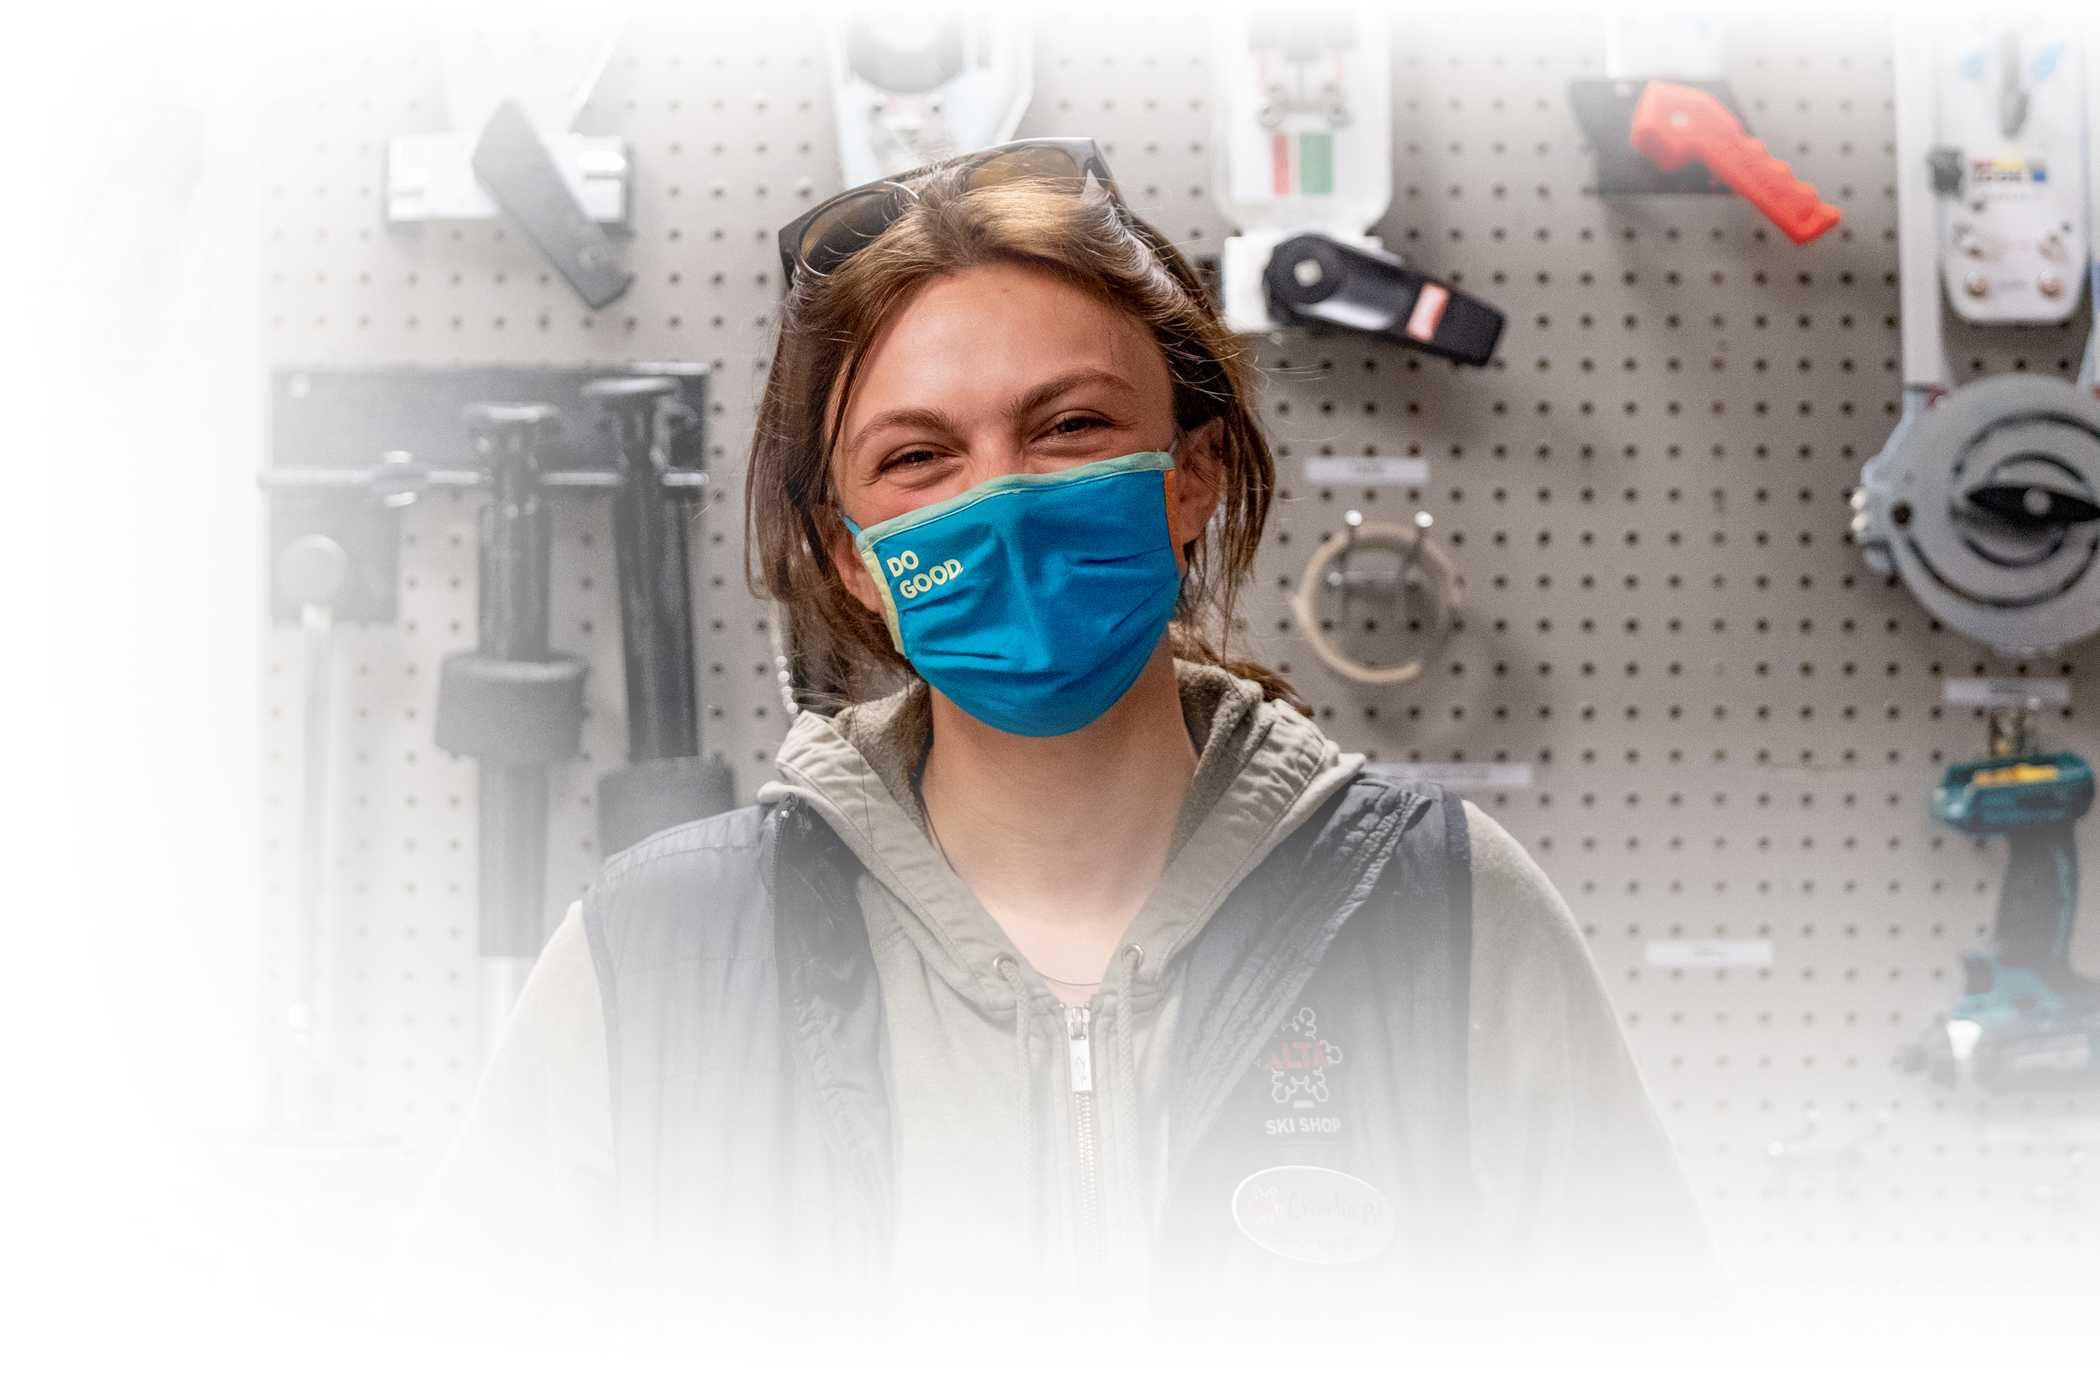 An Alta employee in the Alta Ski Shop